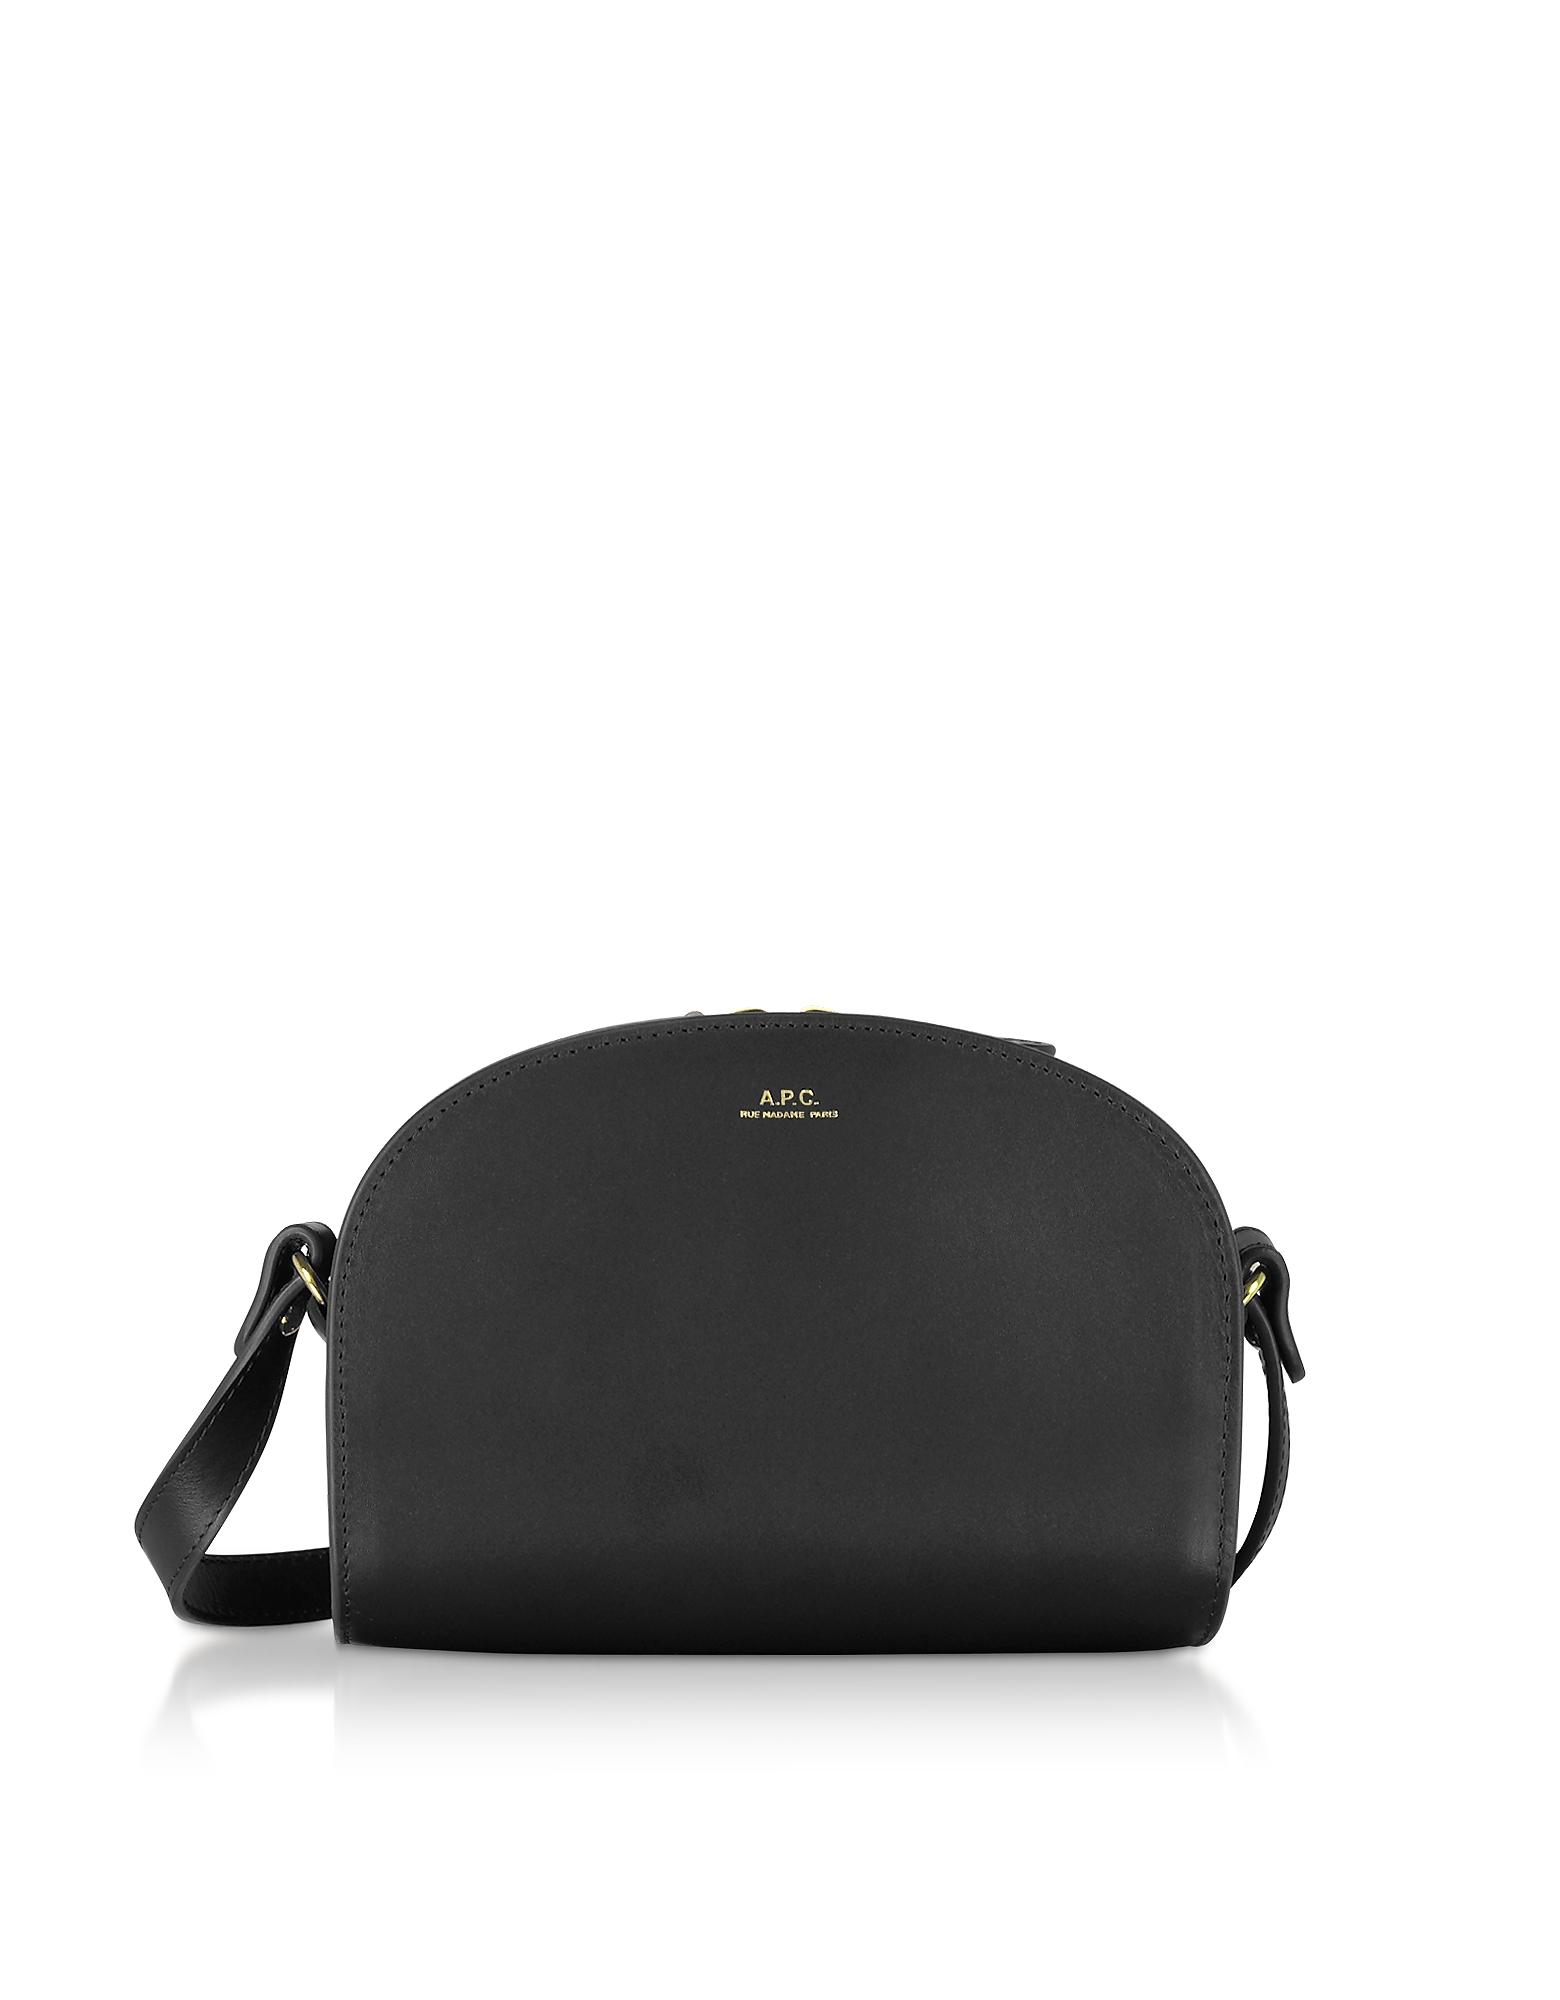 A.P.C. Designer Handbags, Genuine Leather Half Moon Mini Shoulder Bag